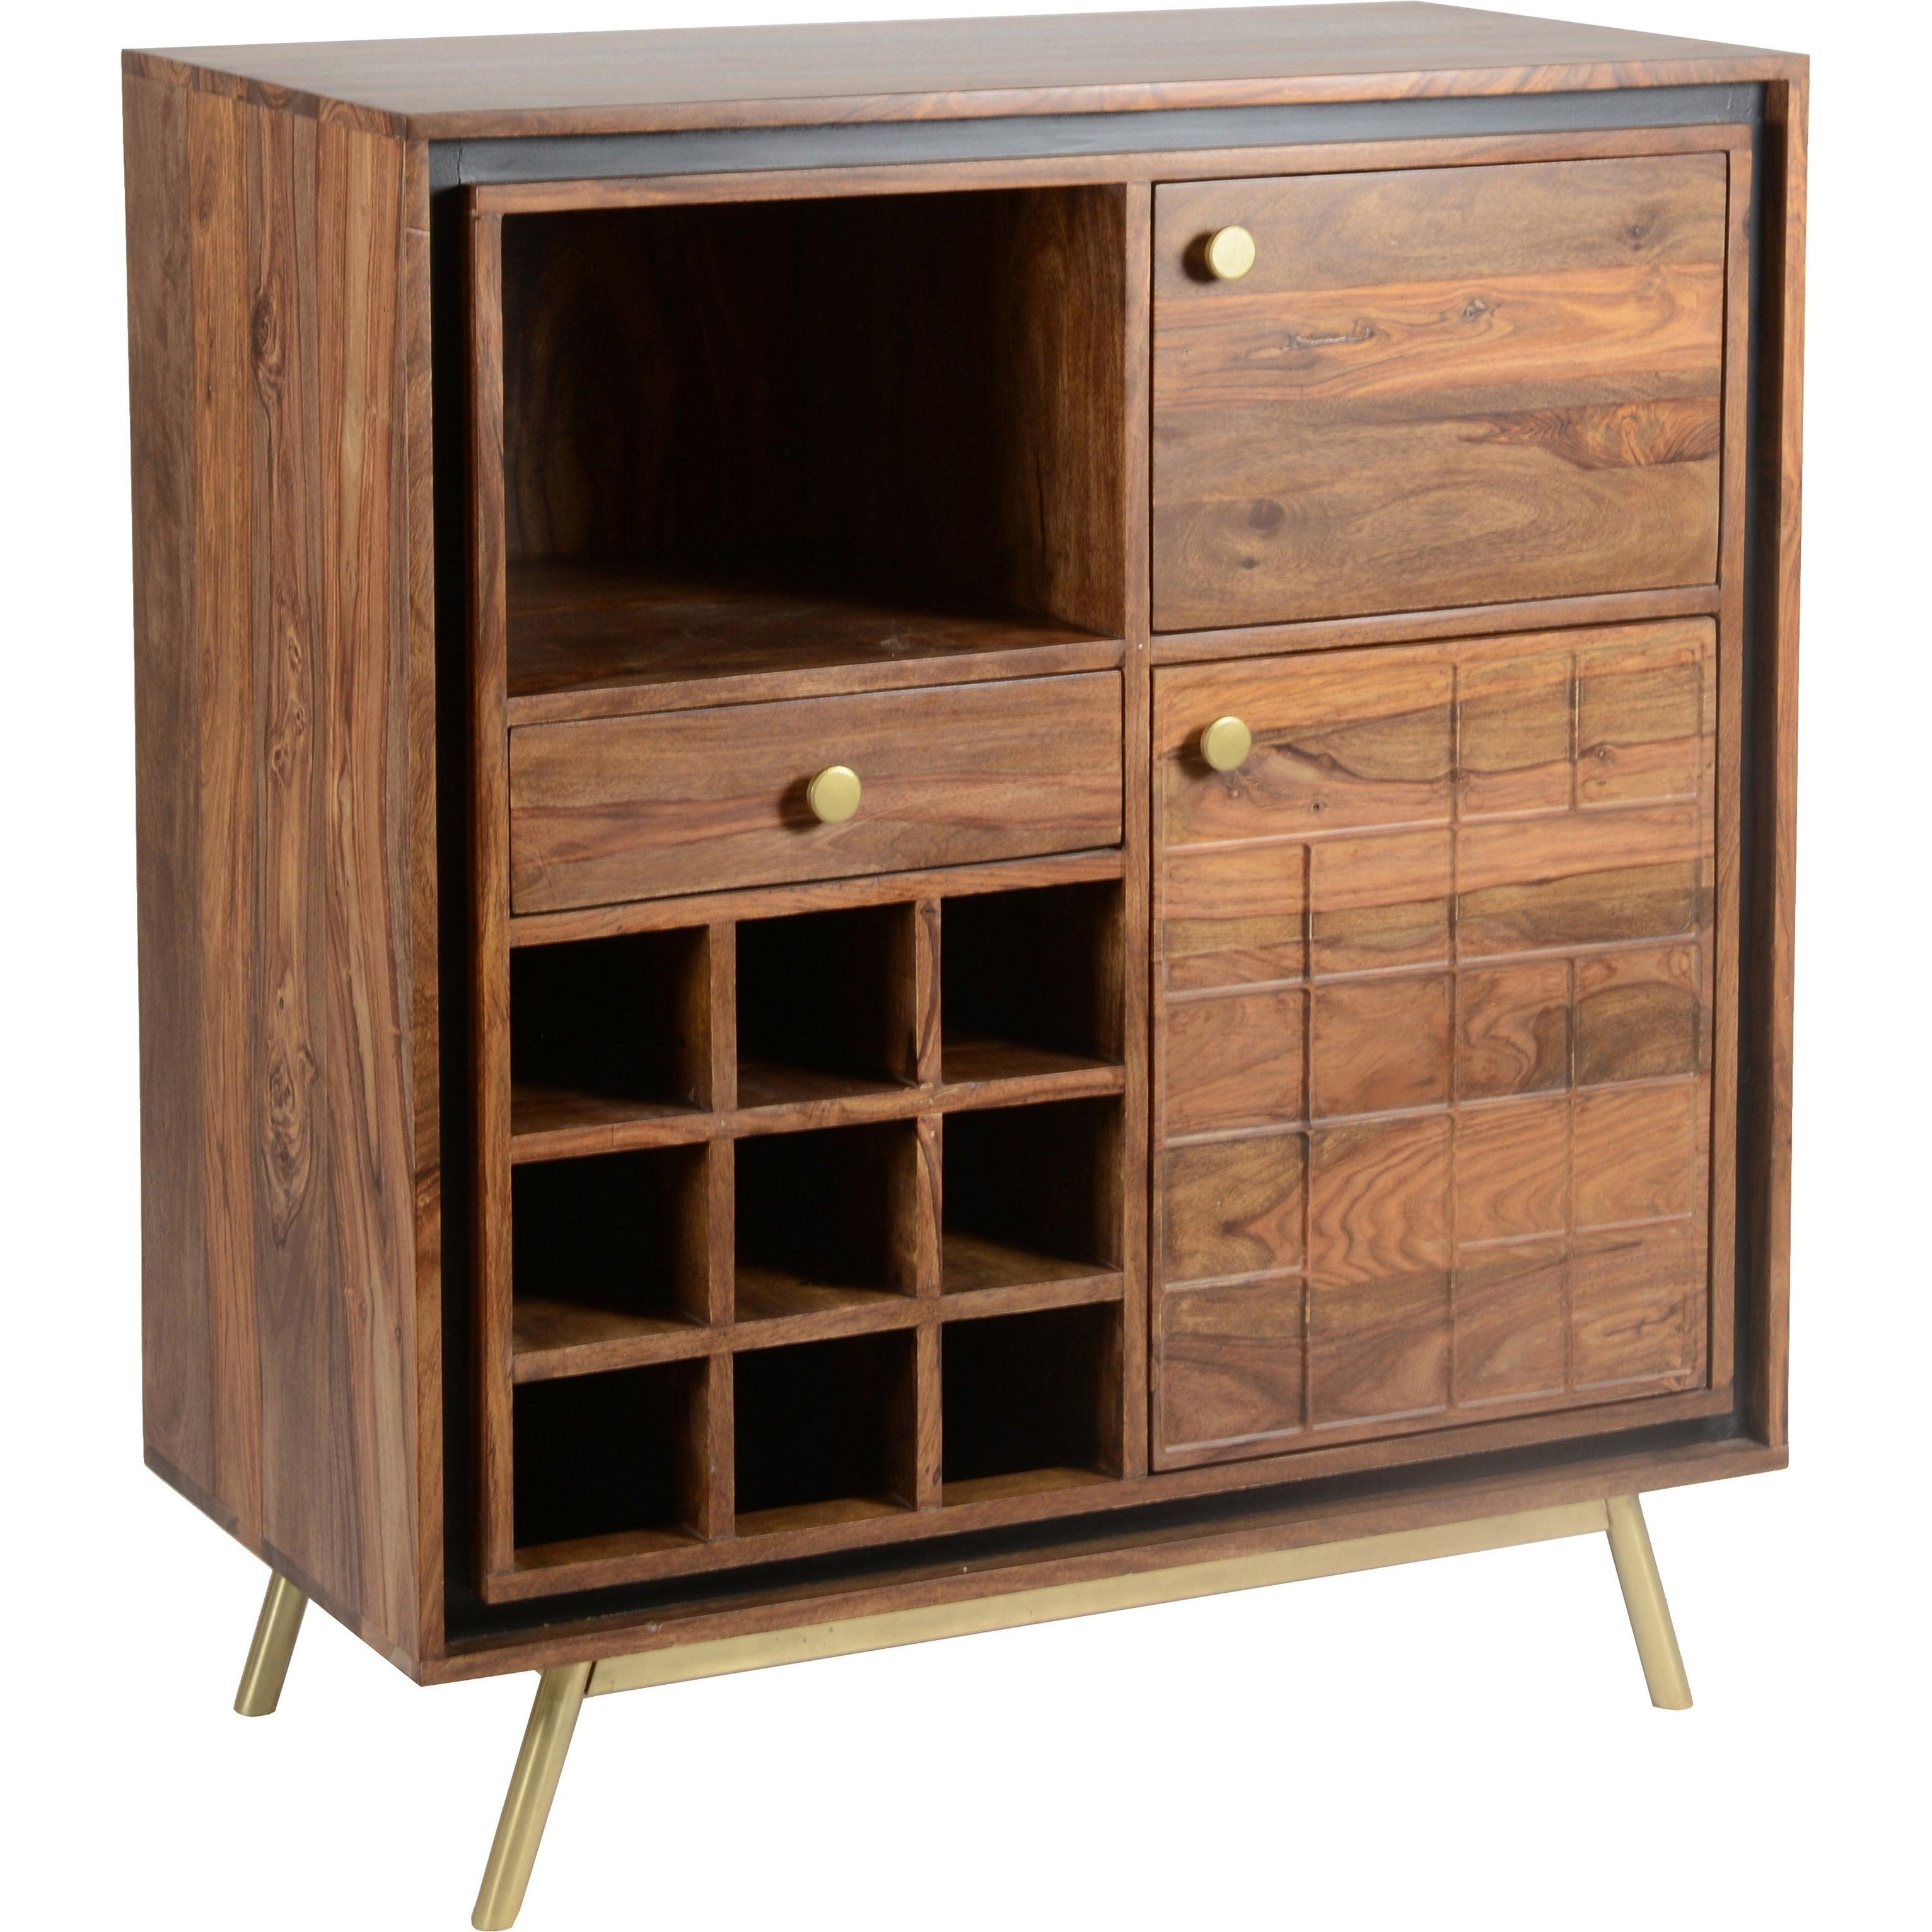 Aurelle Home Othello Brass Wood Mid Century Modern Bar Cabinet 39 X 35 X 18 throughout sizing 3064 X 3064